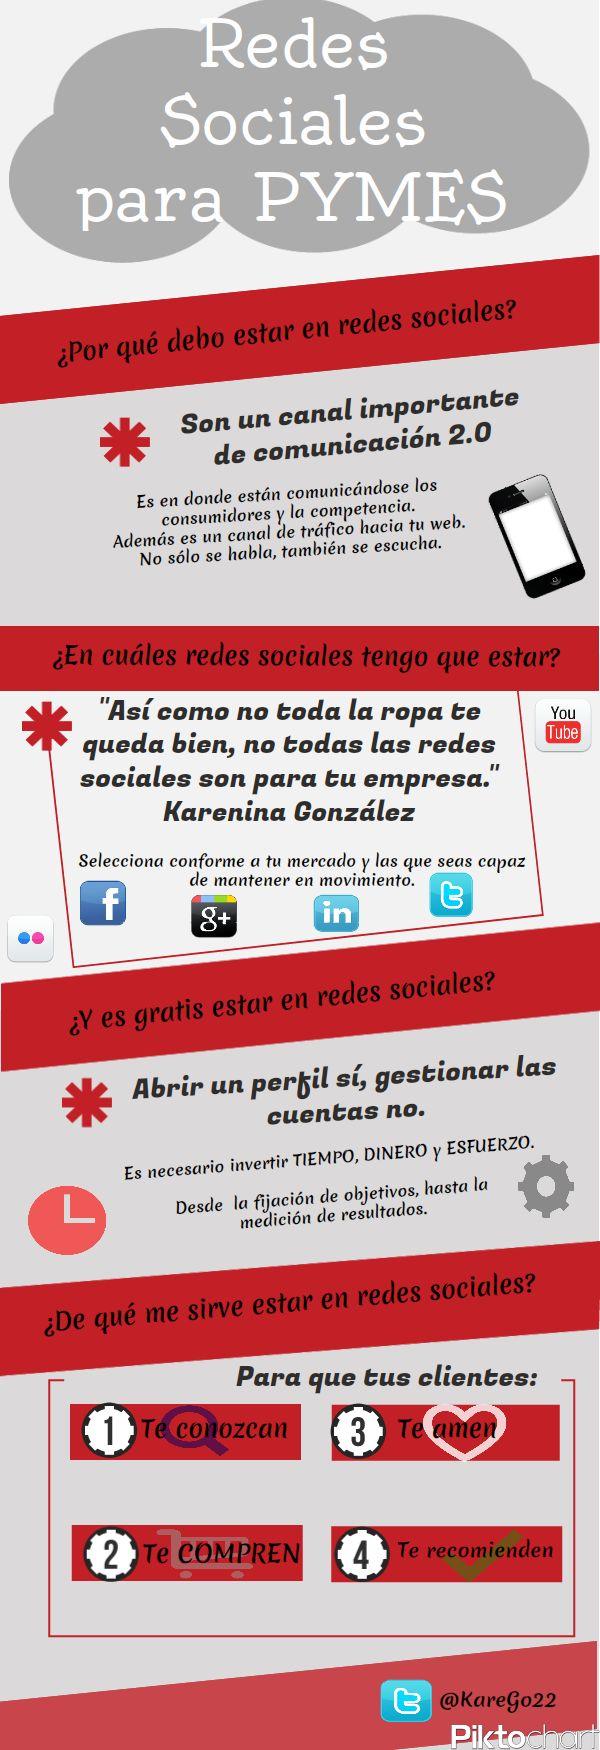 Redes Sociales para pymes #infografia #infographic #socialmedia